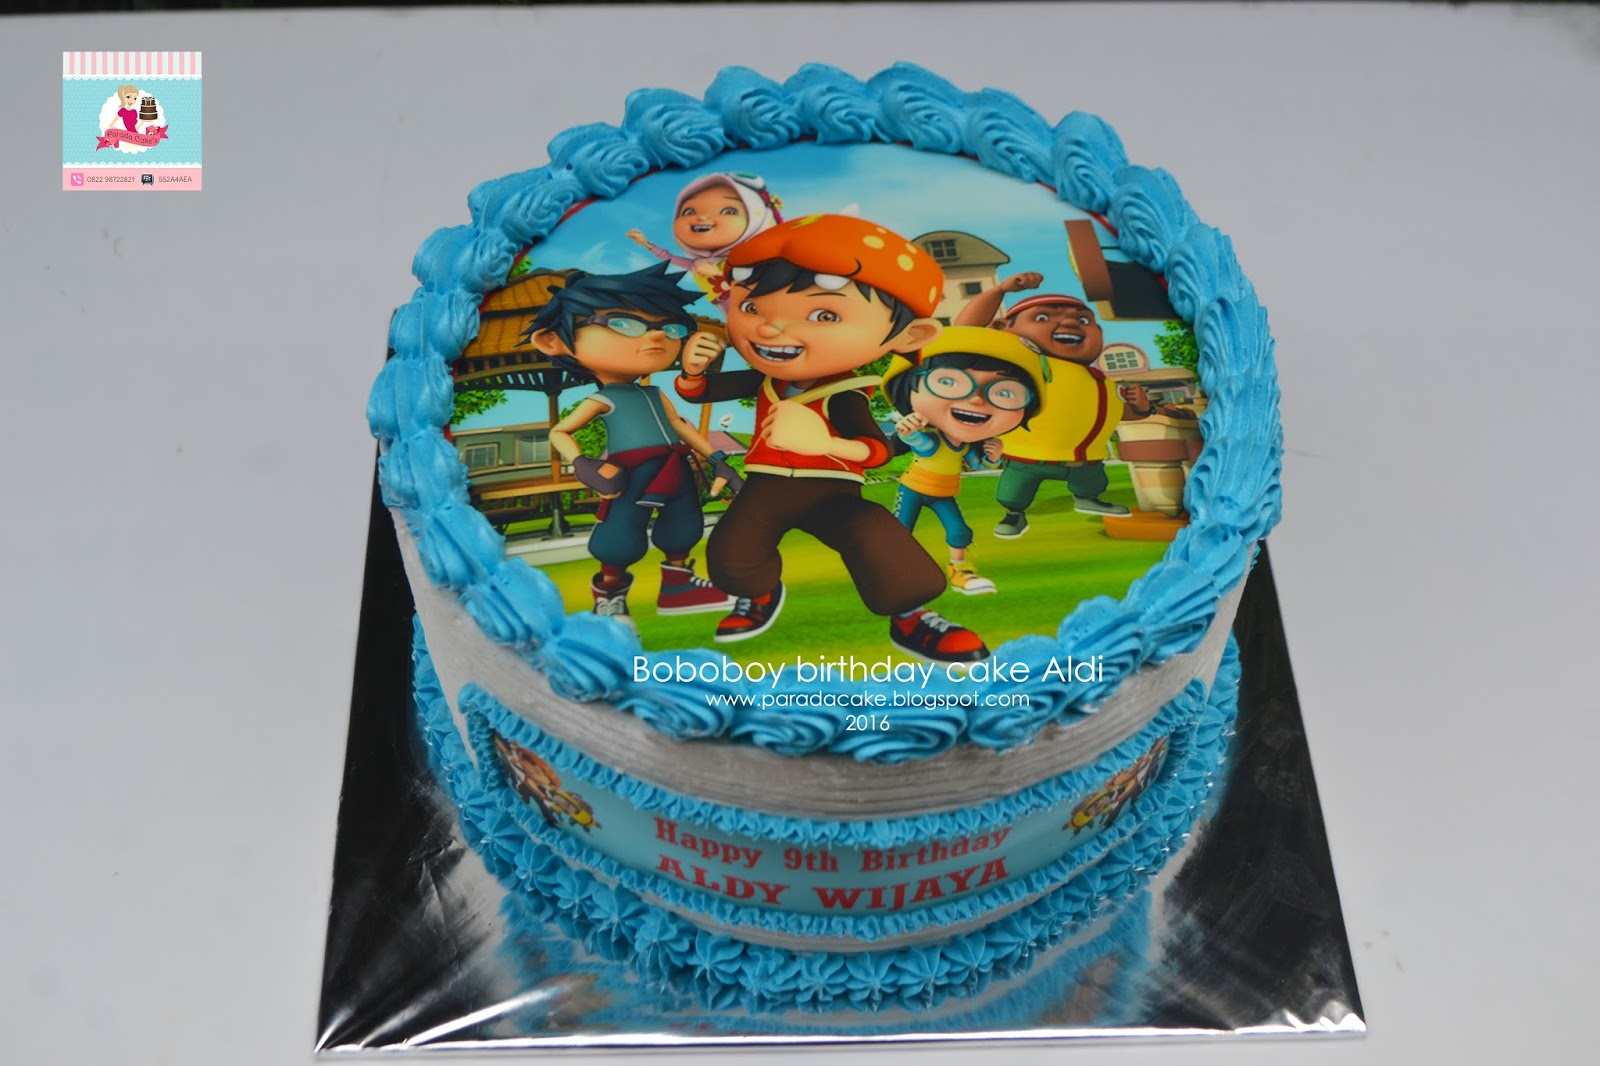 Parada Cake S Boboboy Birthday Cake Aldi Raya Joglo Jakarta Barat